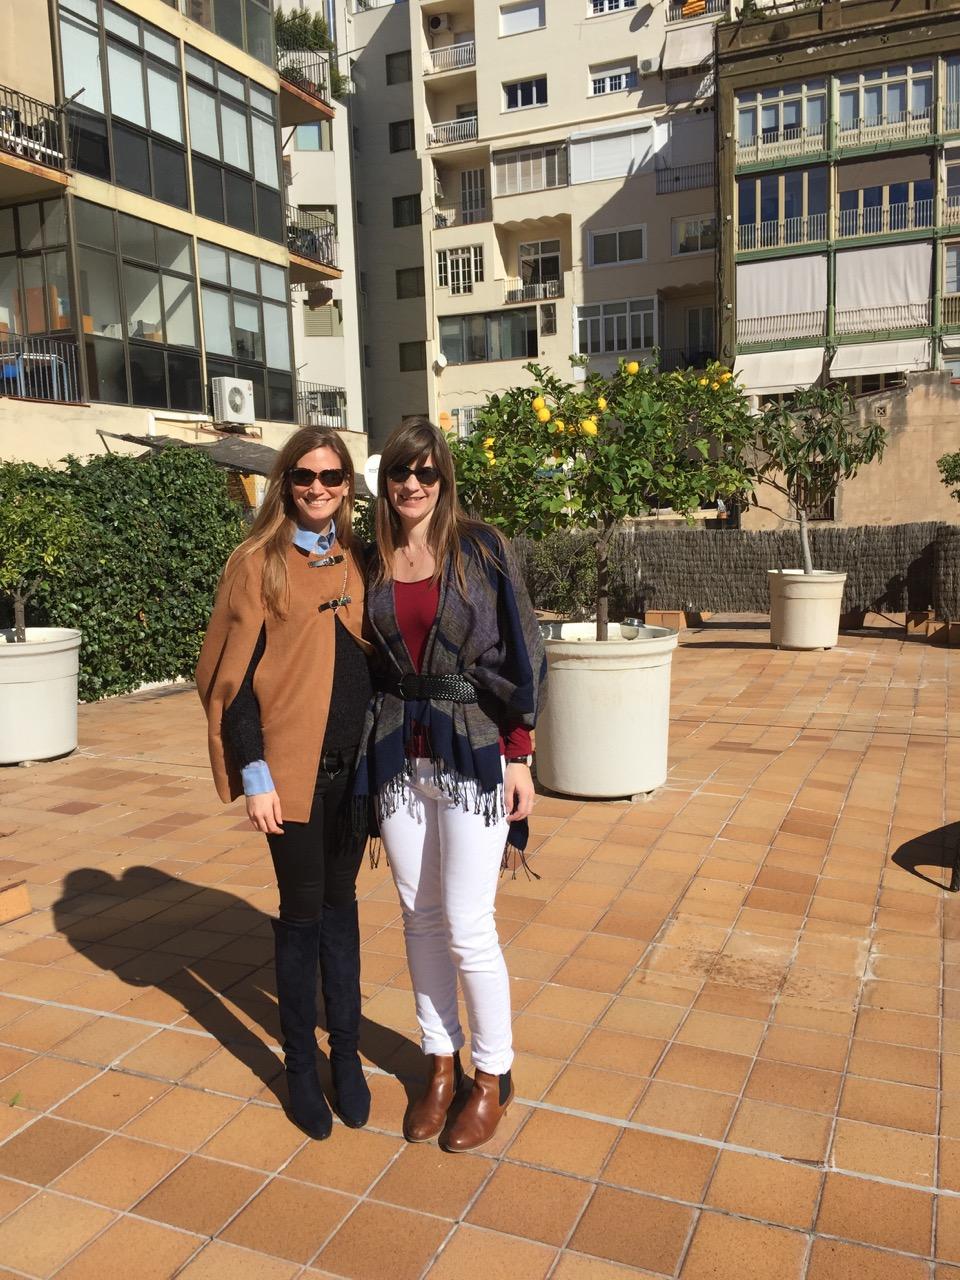 Tall fashion blogger meet-up